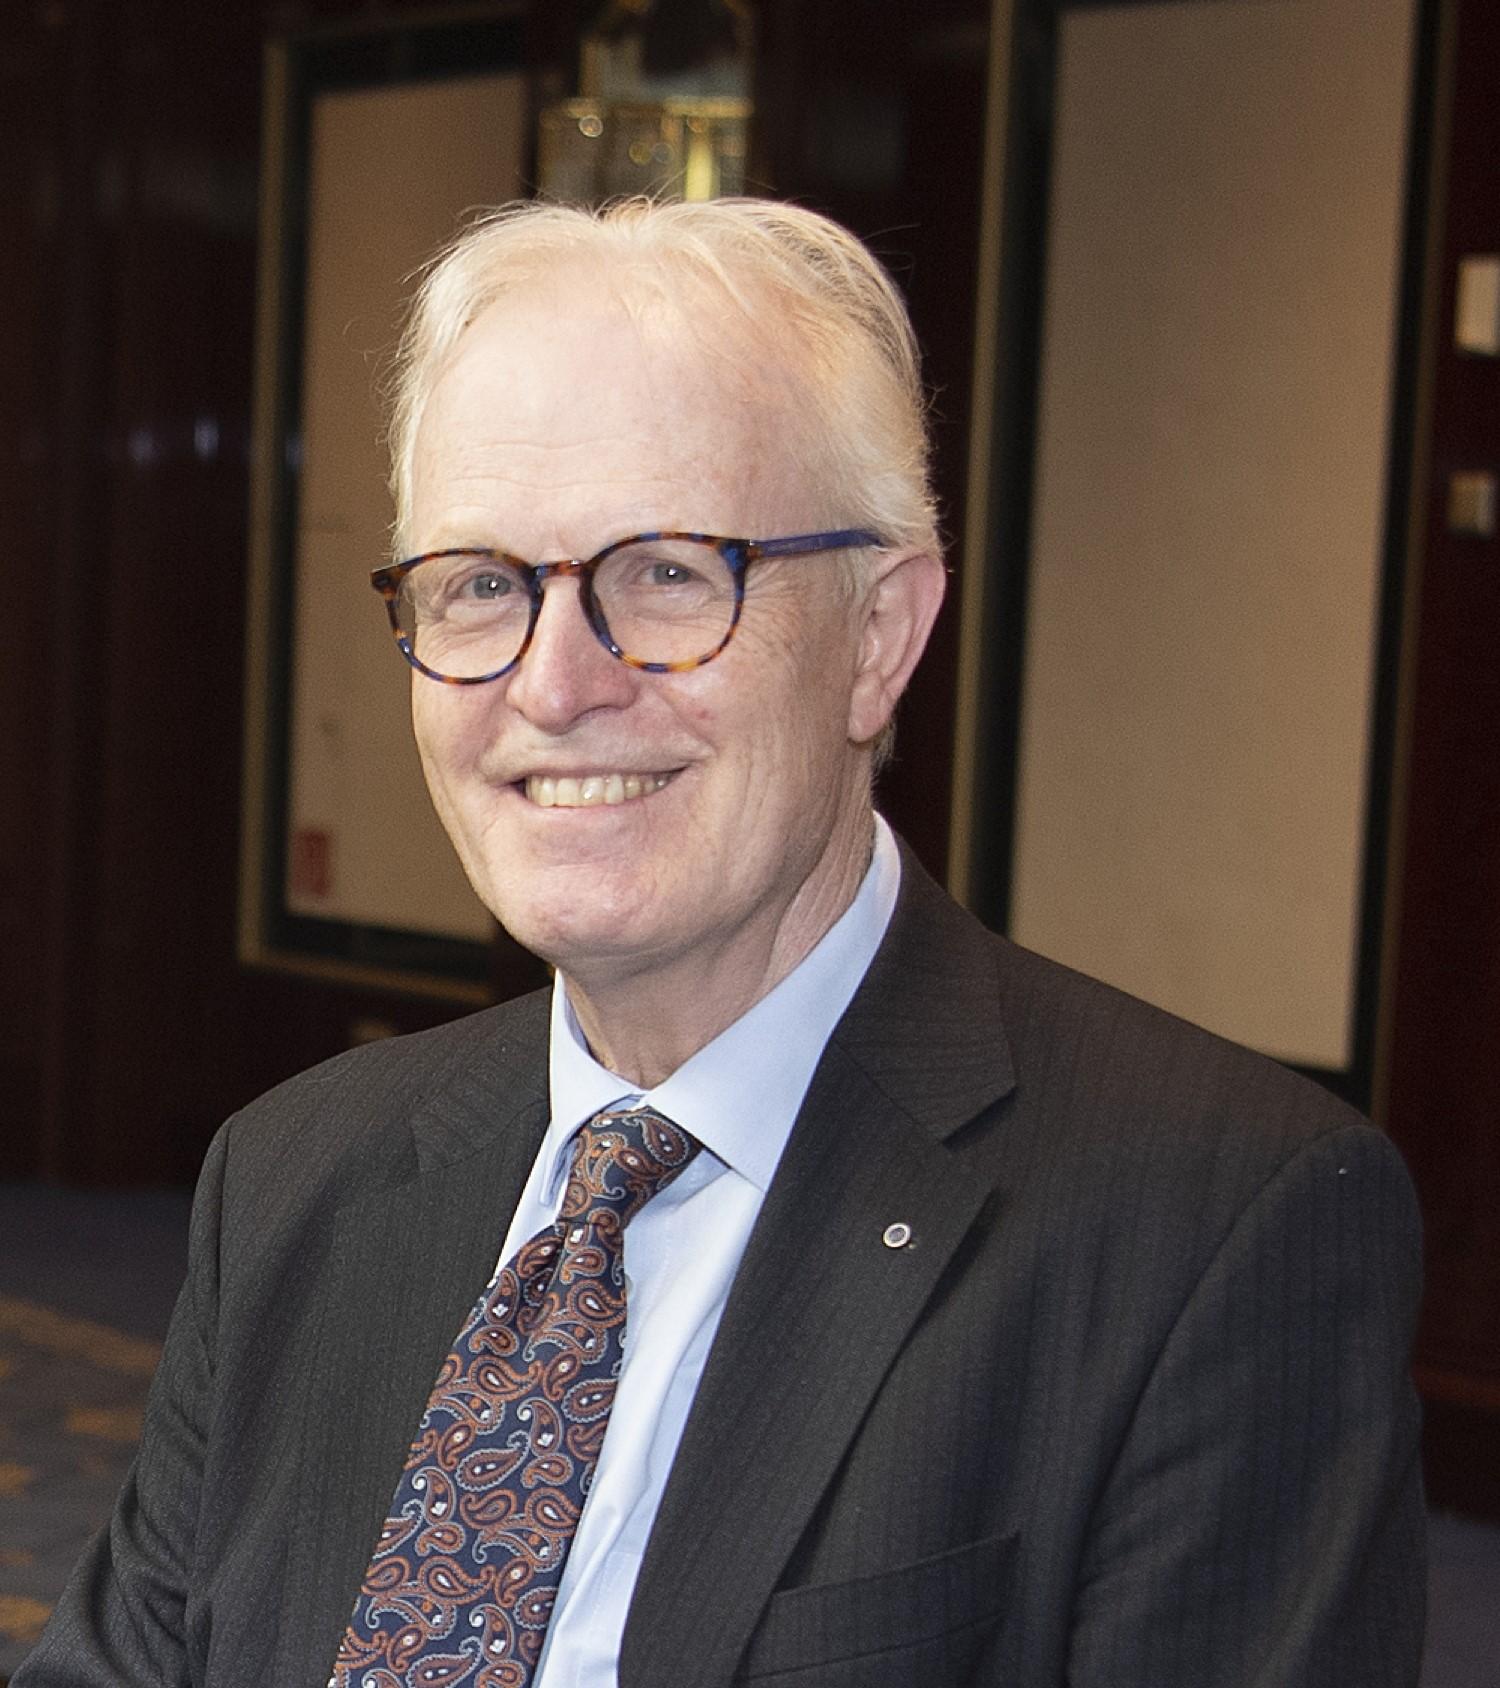 Prof. Dr. Andreas Goldschmidt